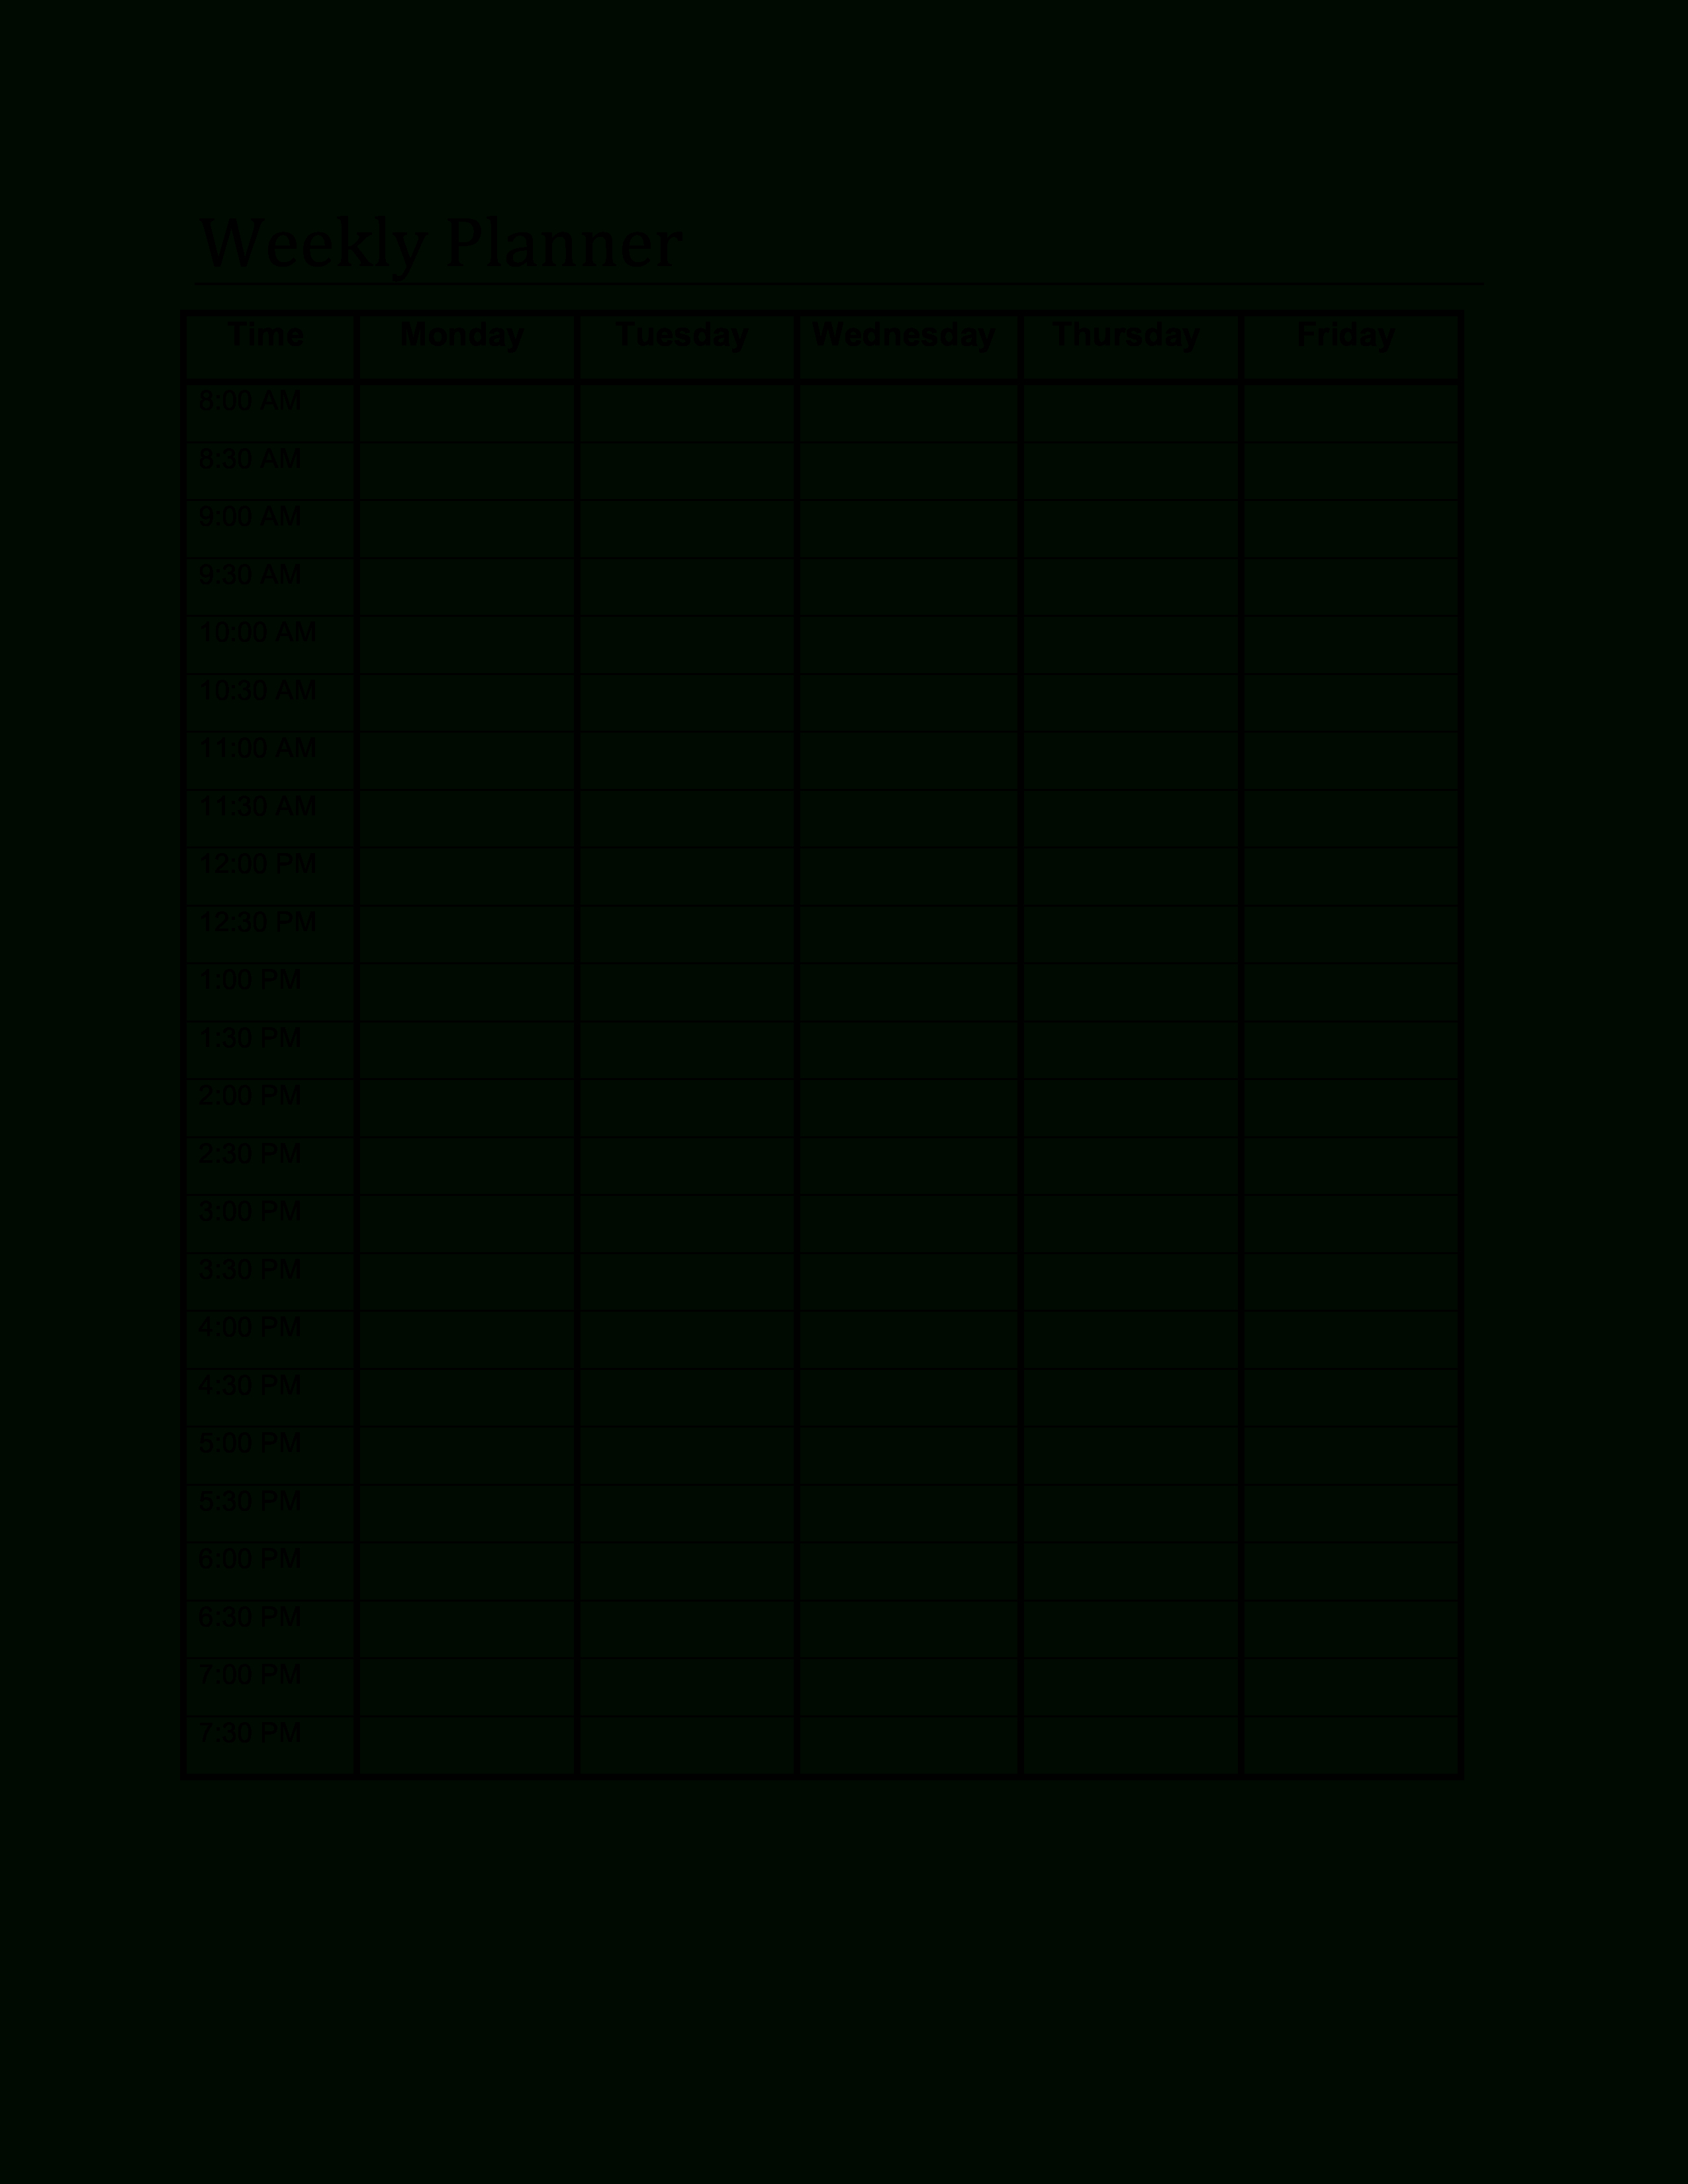 Free Printable Blank Weekly Planner Templates At Al Pdf Downloadable with Printable Blank Weekly Calendars Templates